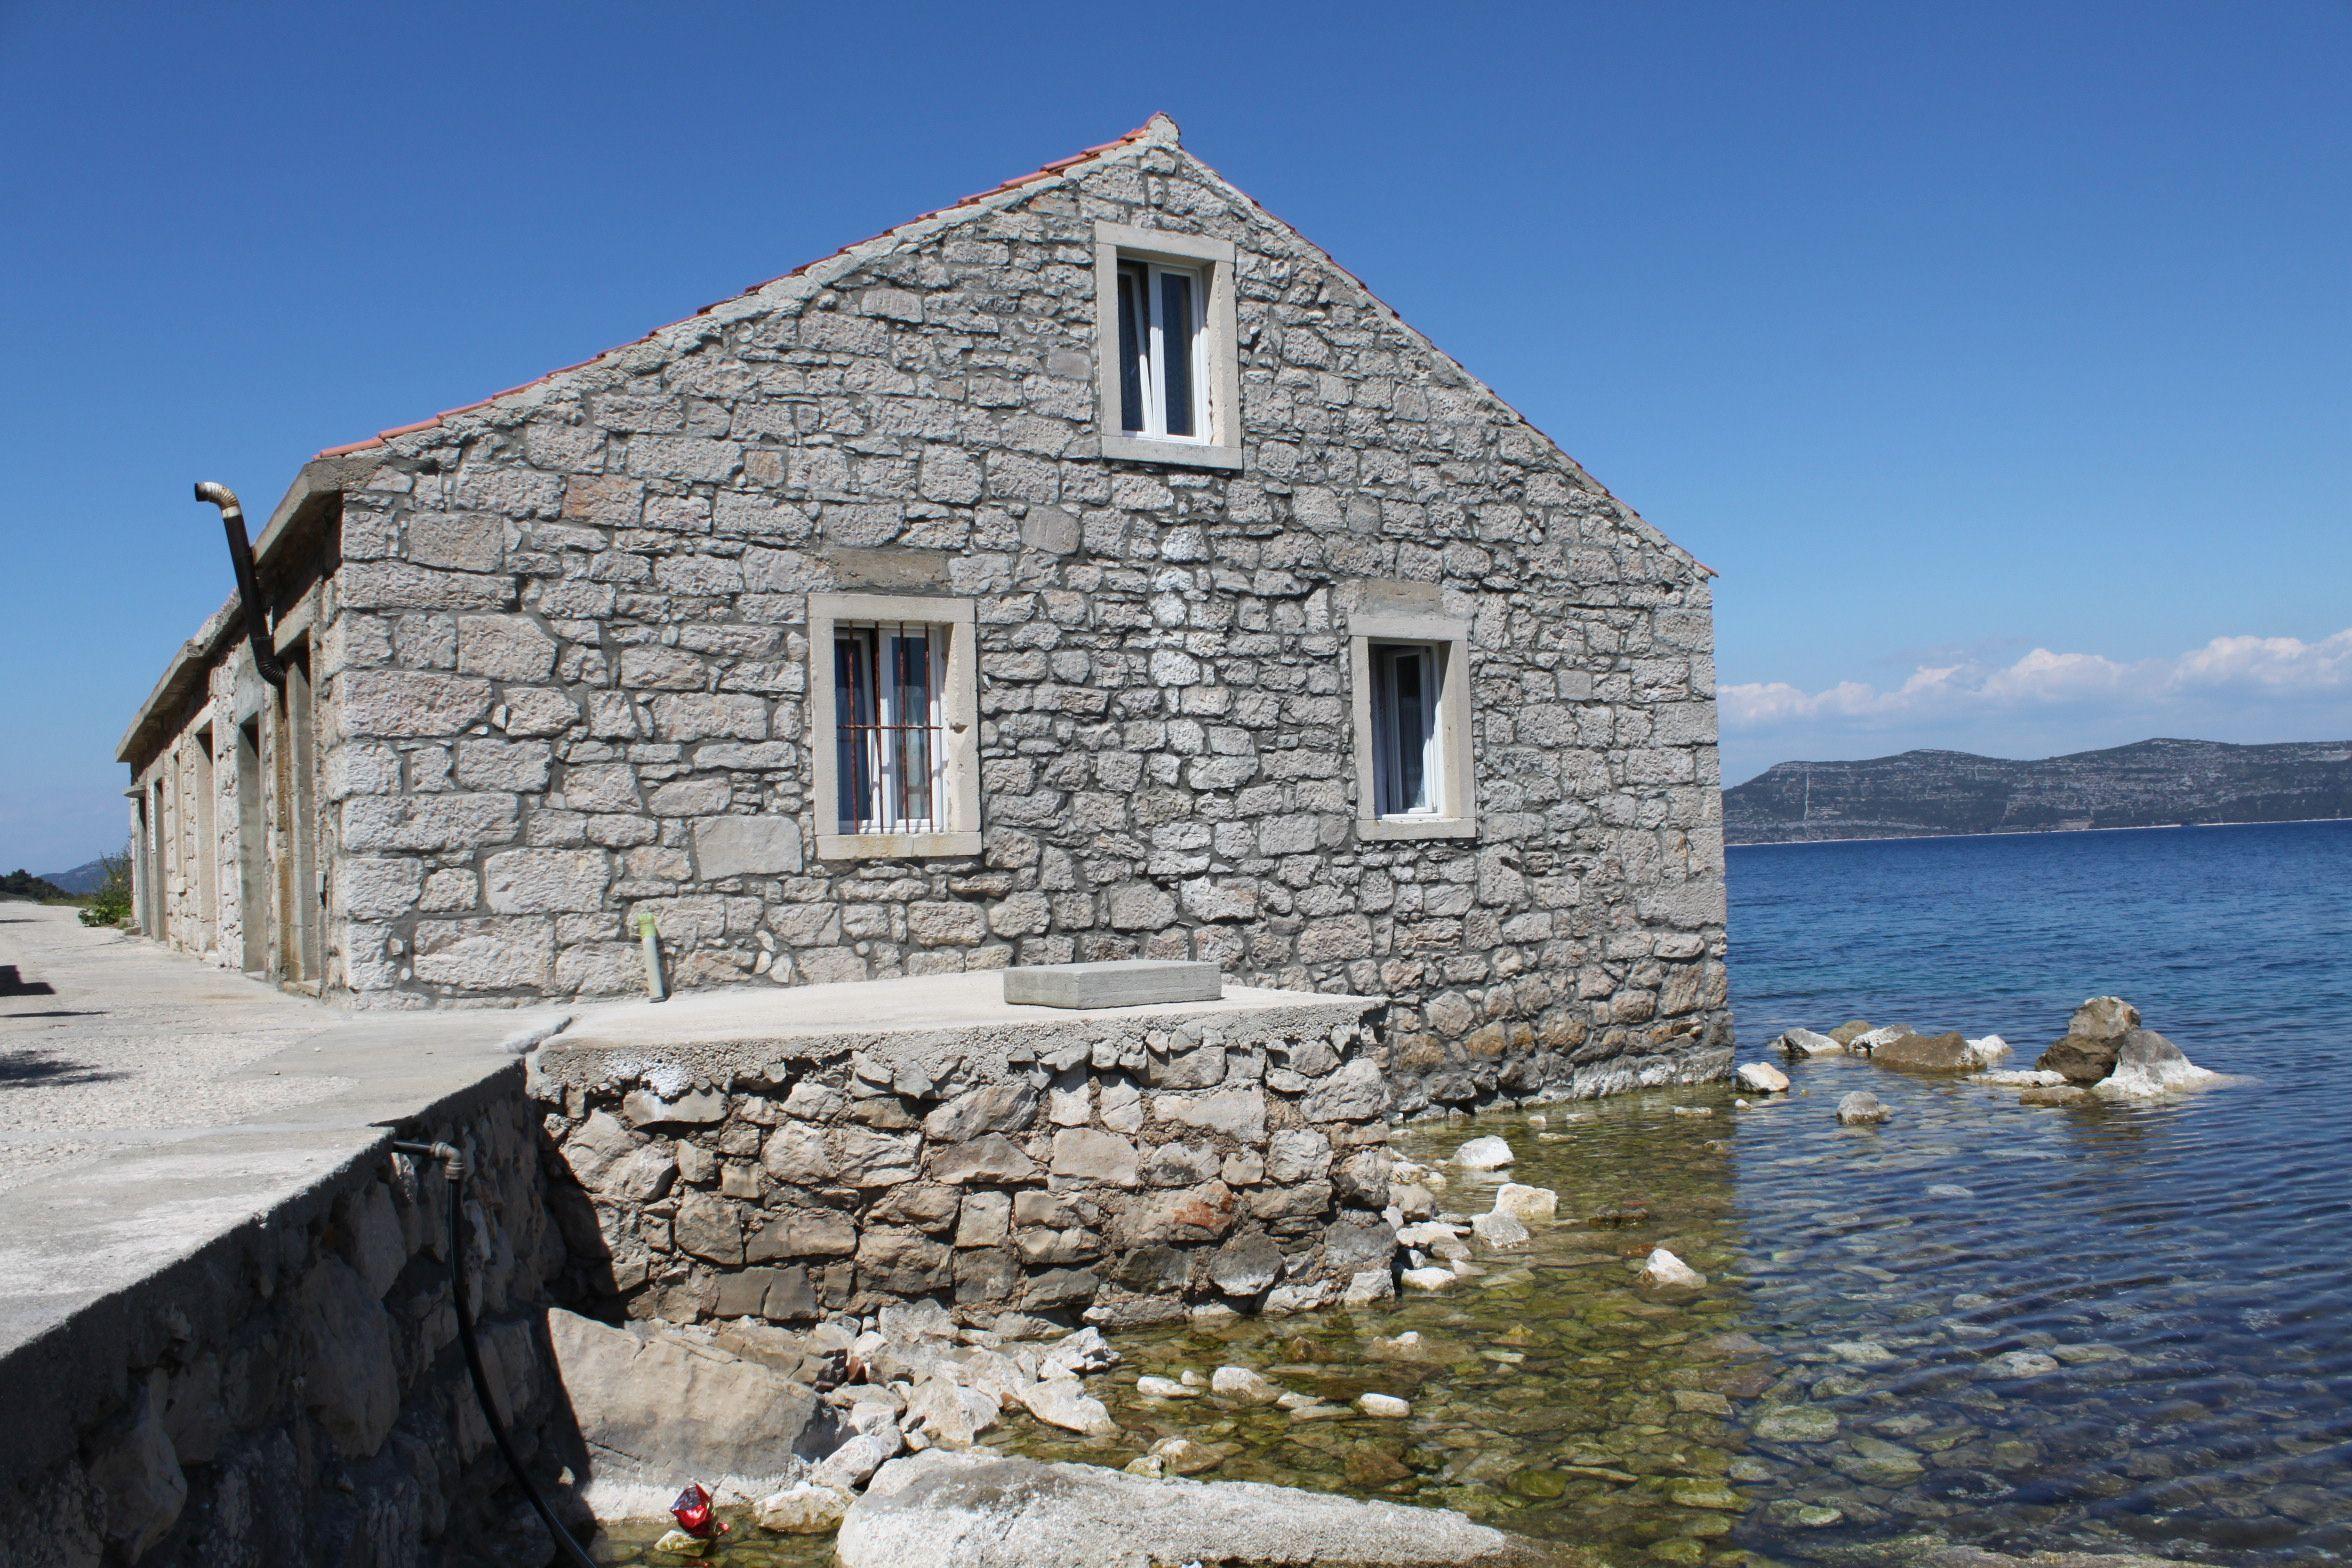 Mali Iž, Adriatic.hr